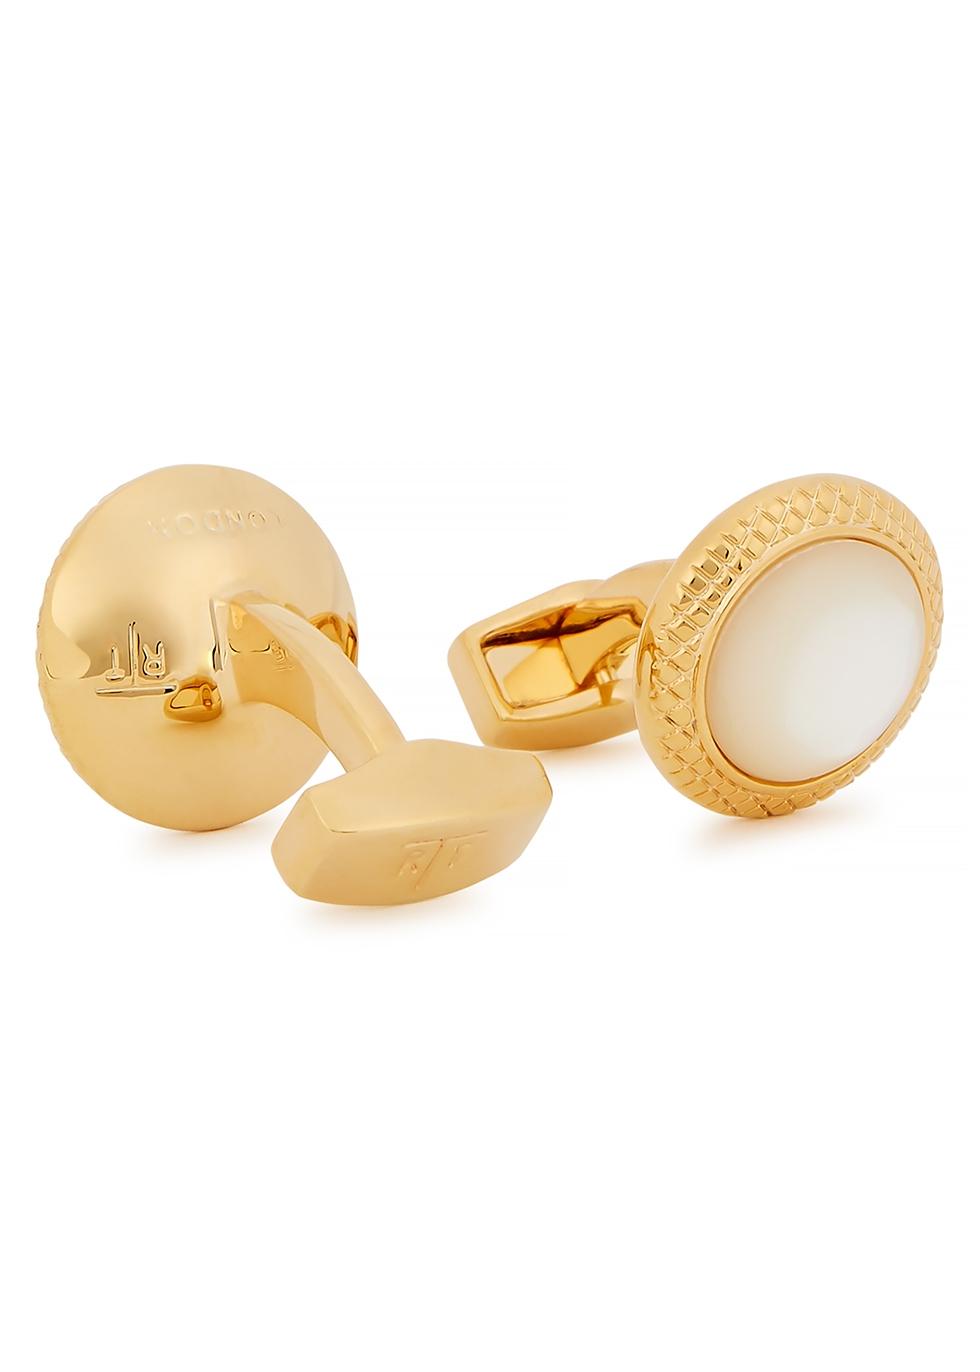 Bullseye gold-tone cufflinks